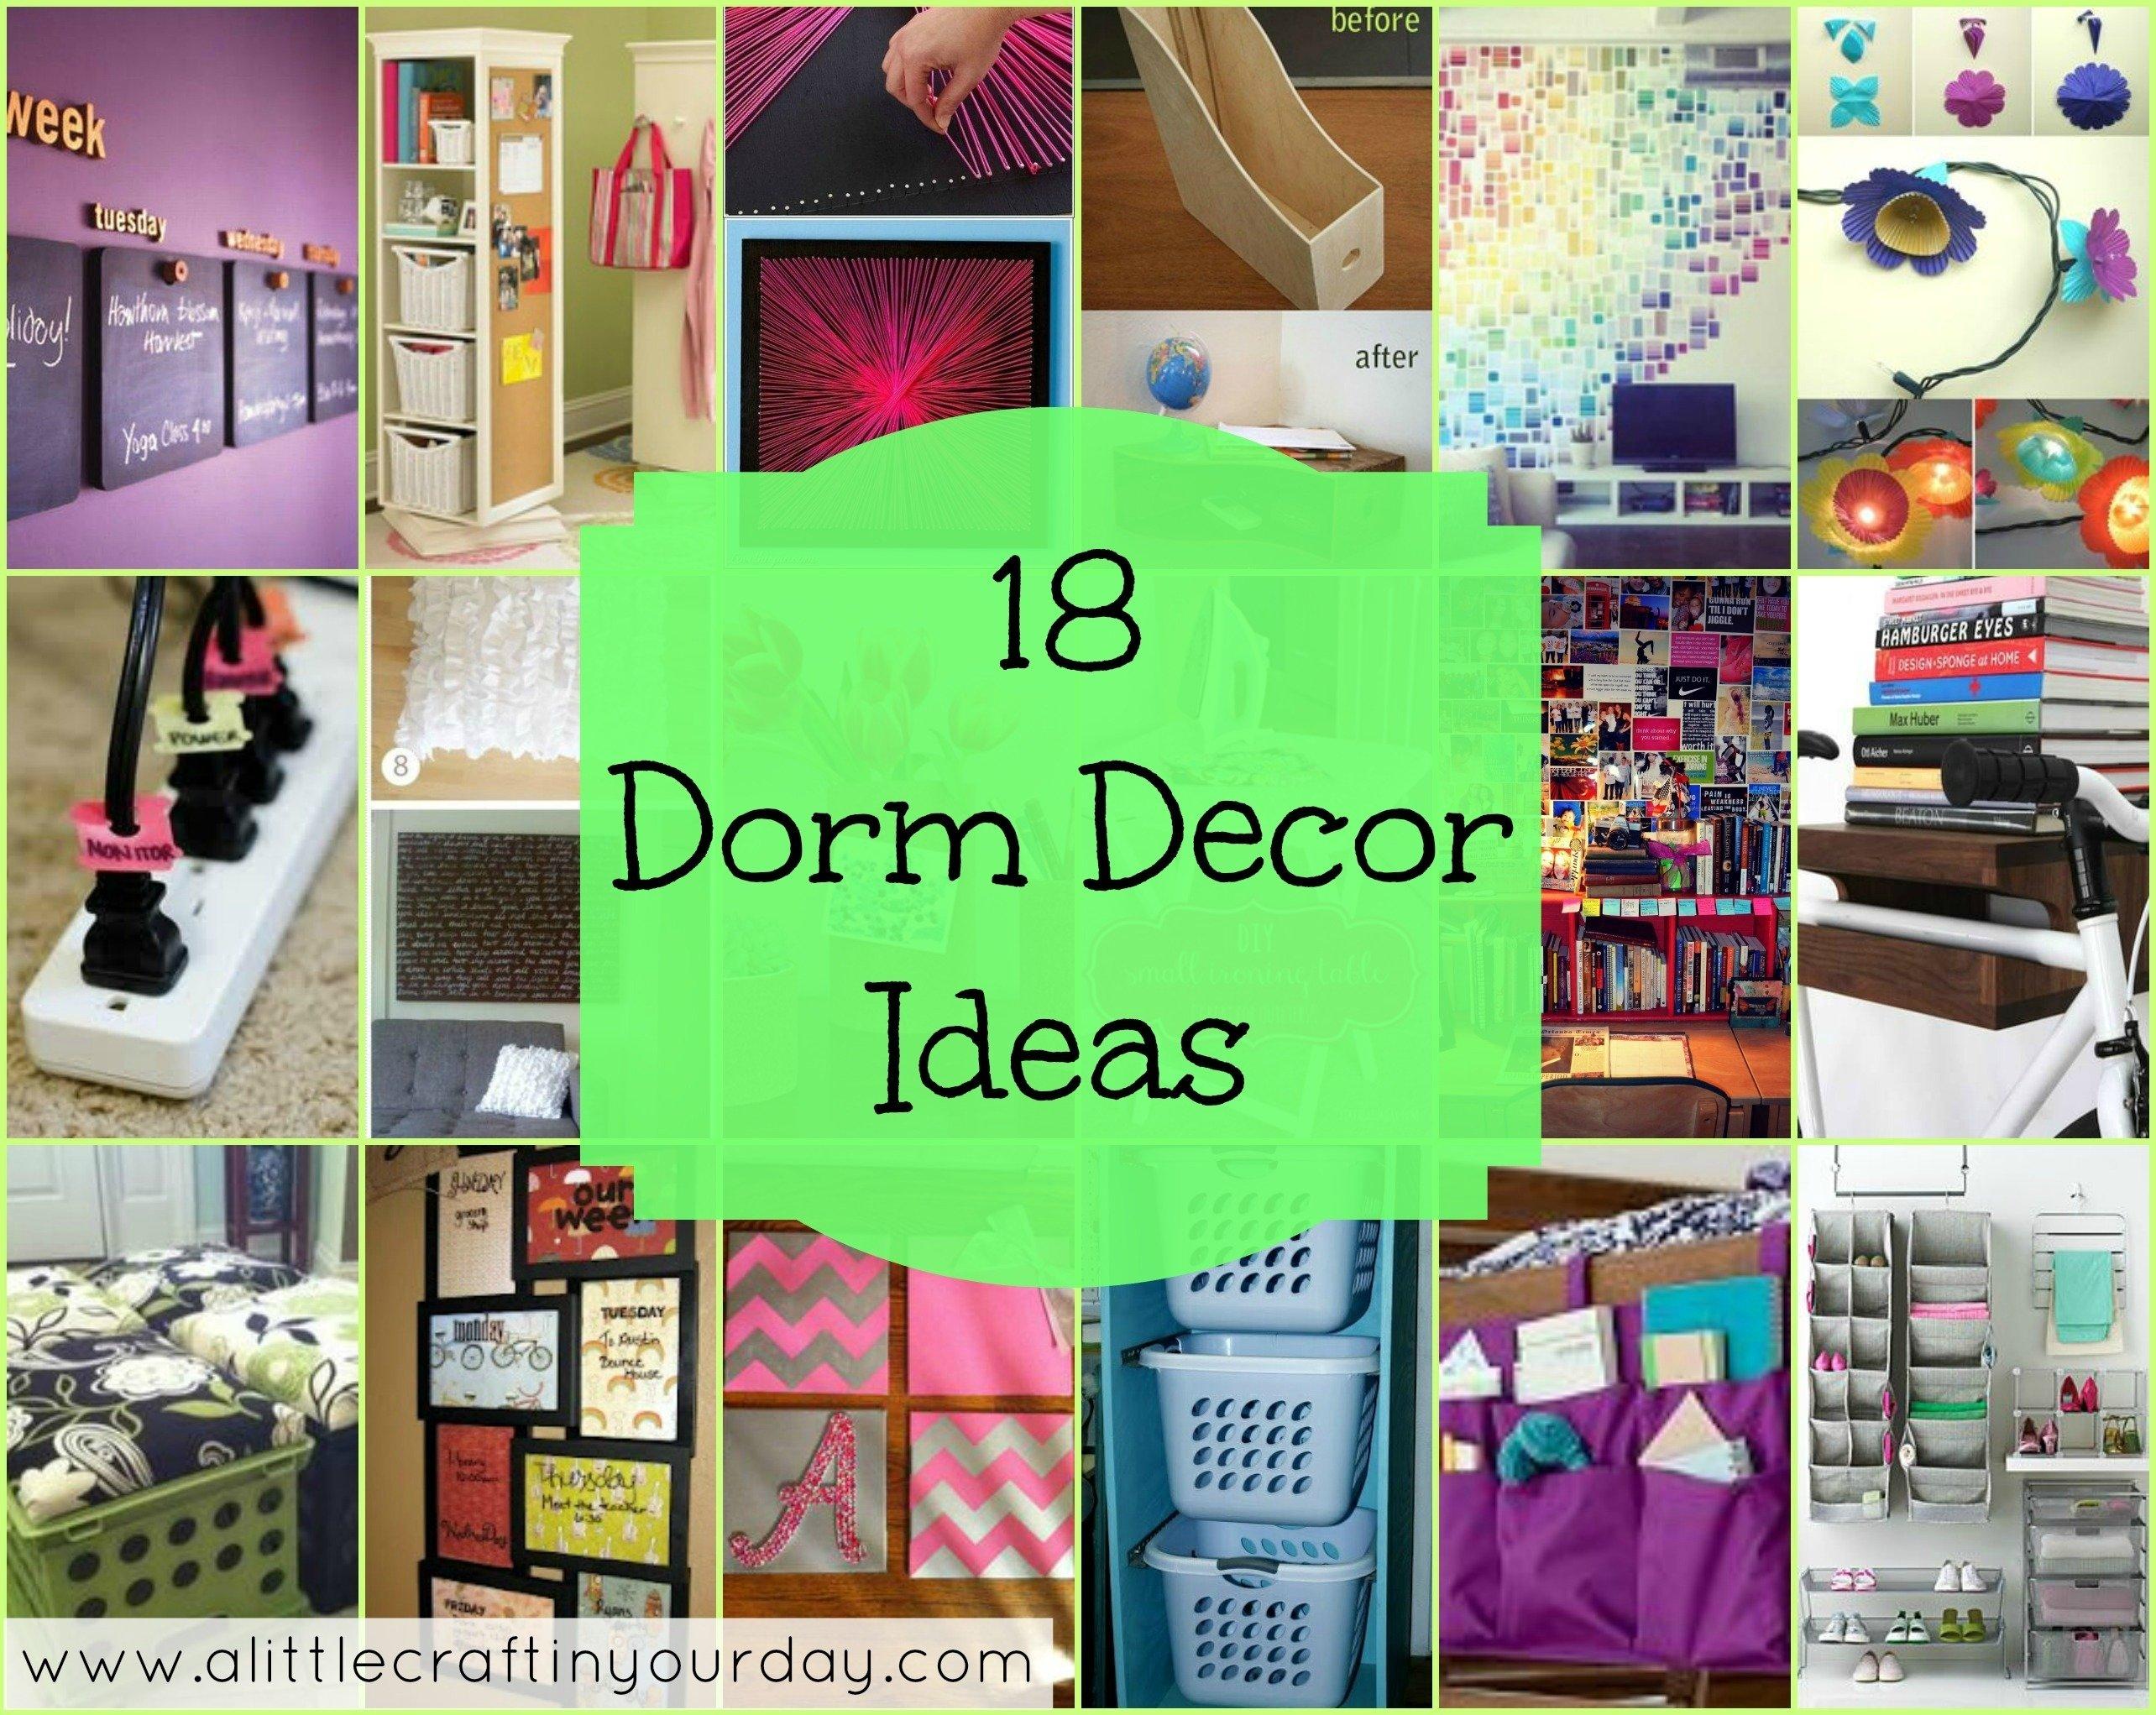 10 Cute Dorm Room Decorating Ideas Diy 18 dorm decor ideas a little craft in your day 1